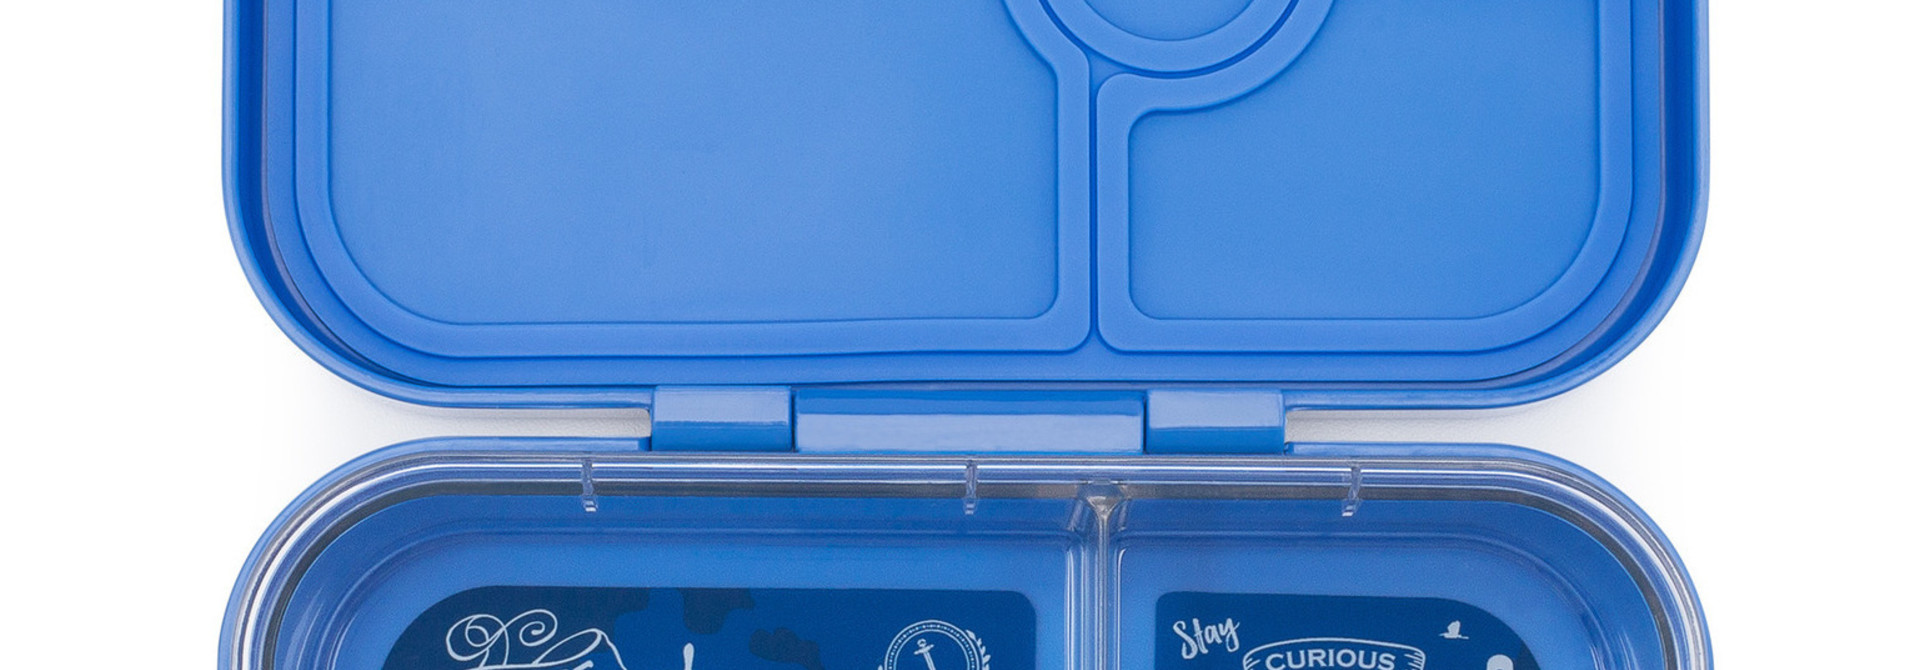 Yumbox Panino 4-sections Jodphur blue / Explore tray